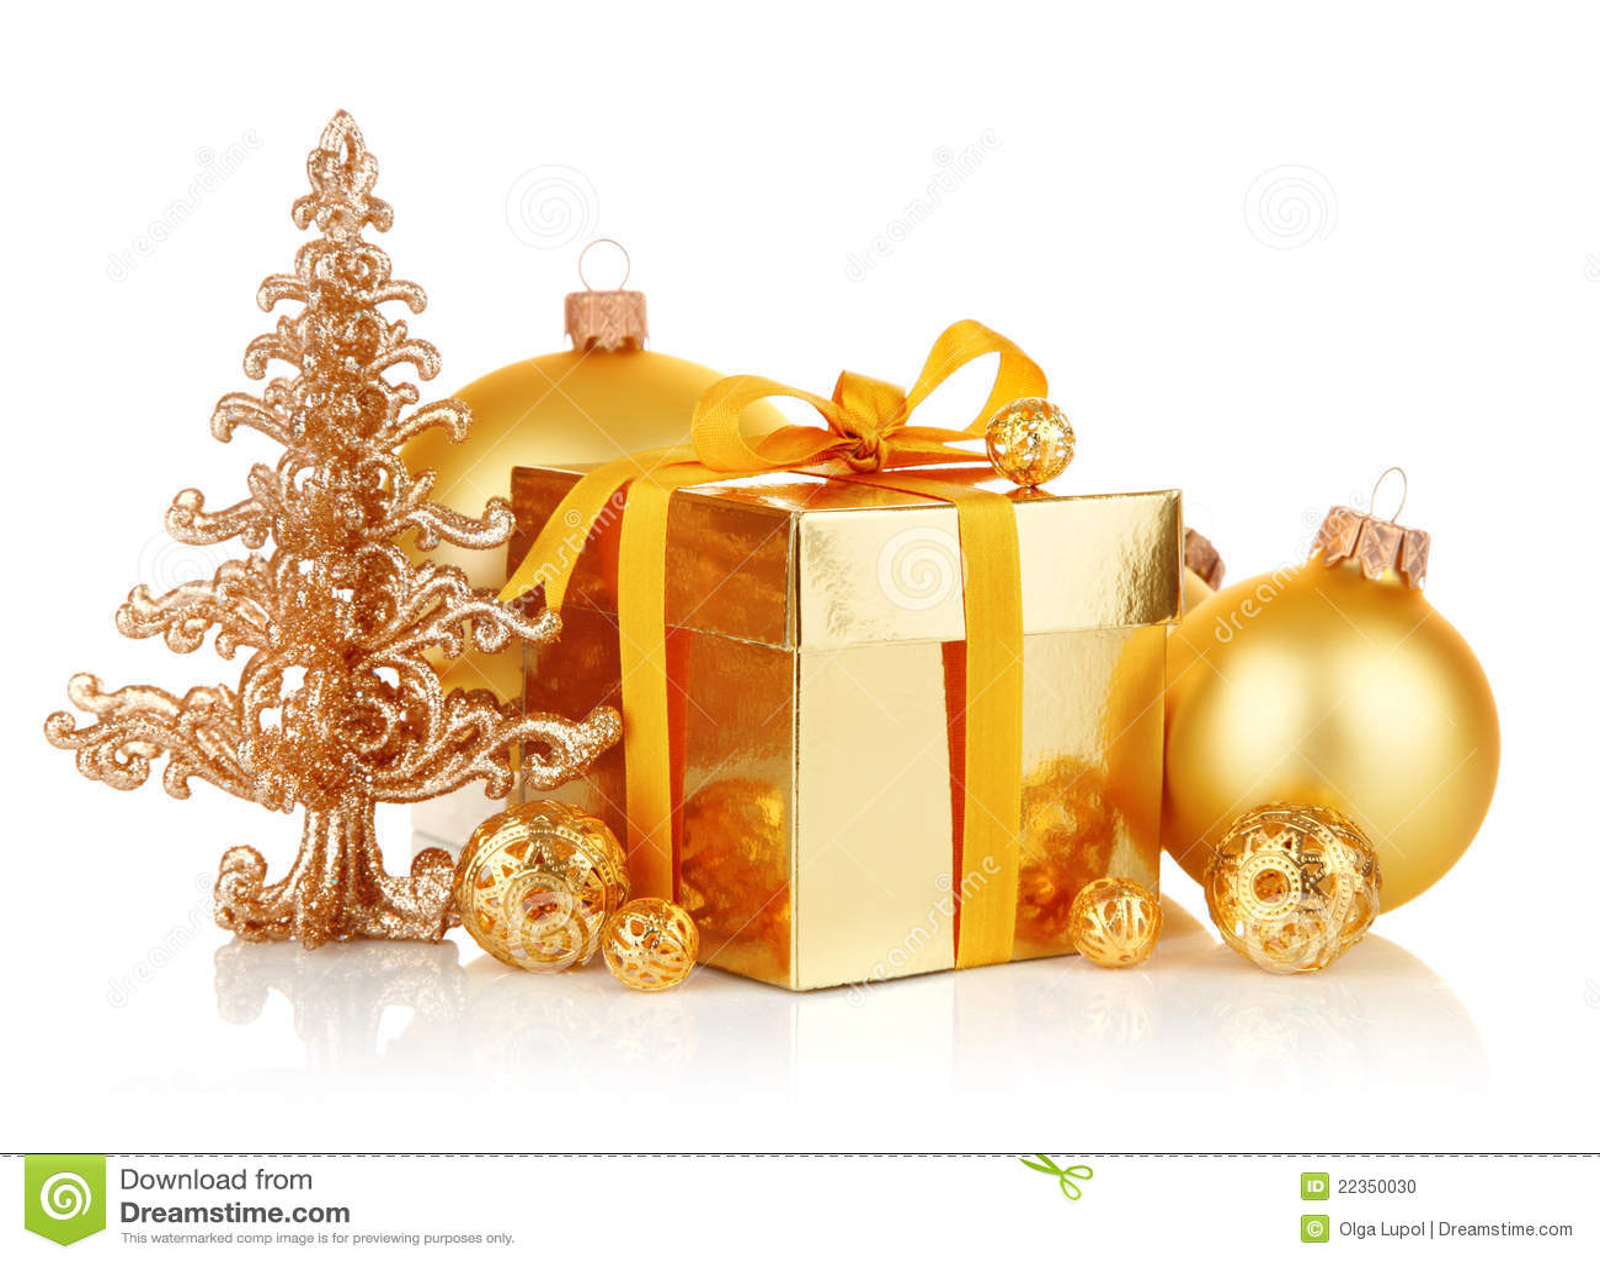 Gold Christmas Gift With Balls Stock Photo Image 22350030